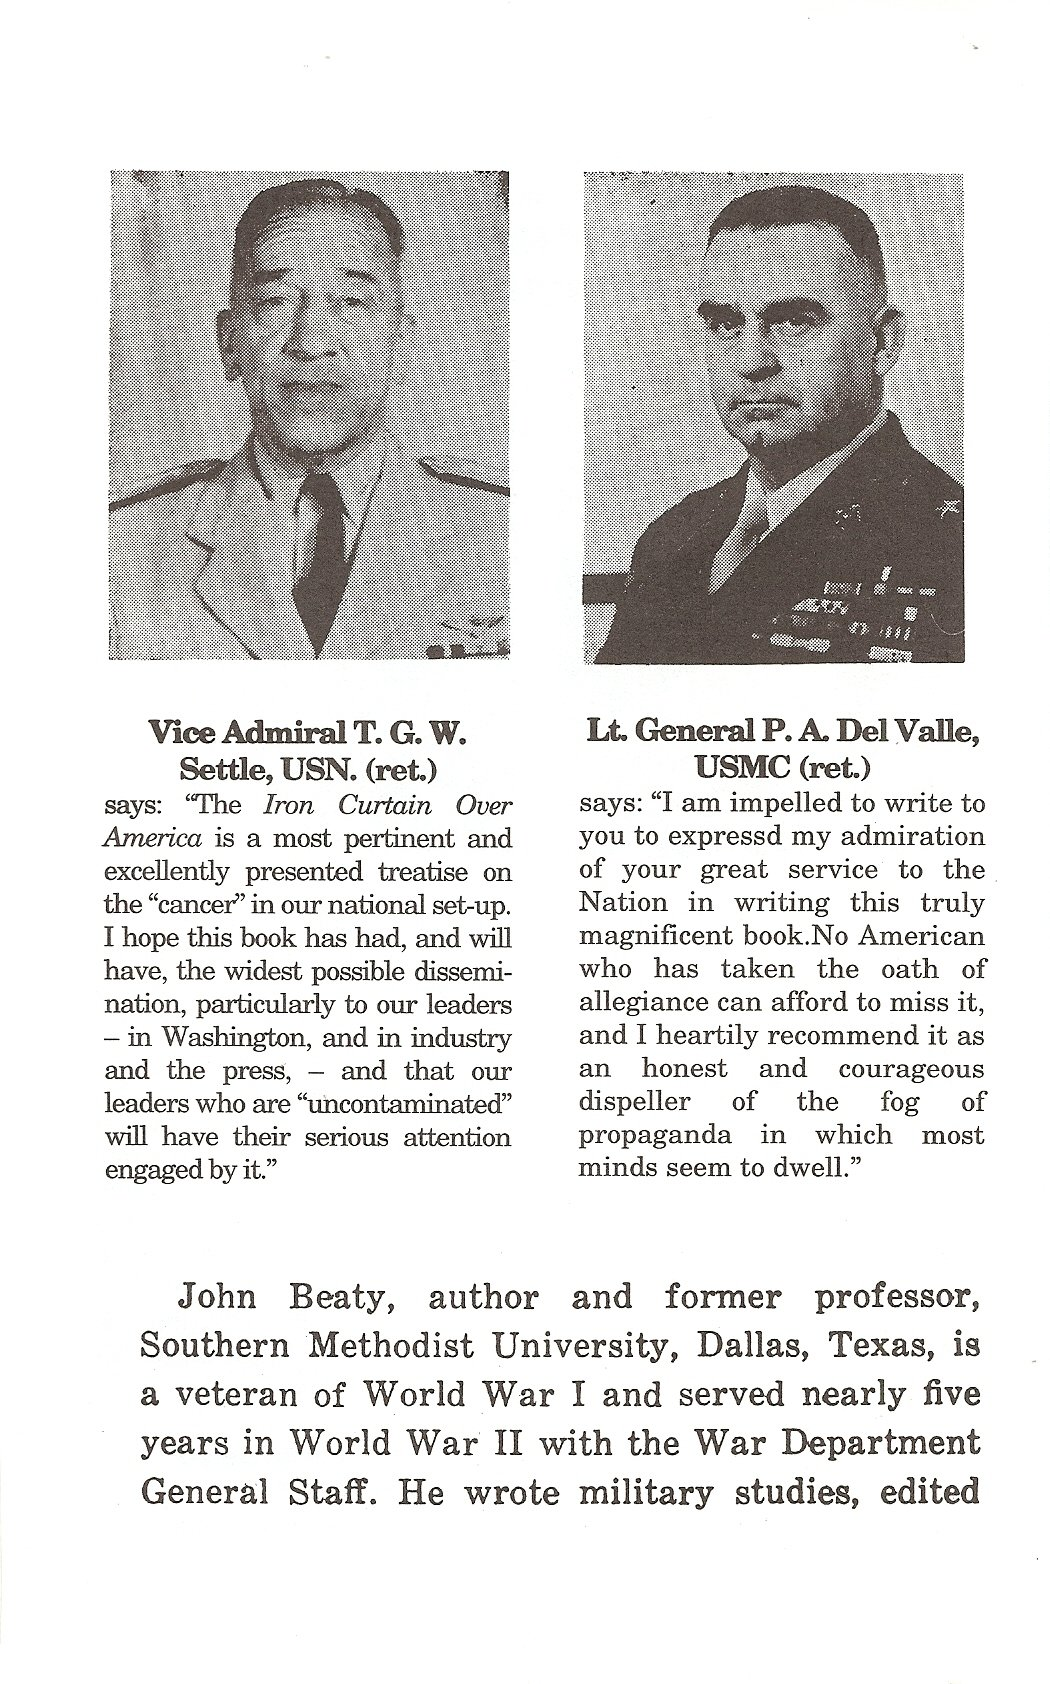 The Iron Curtain Over America Amazoncouk John Beaty 9781112762062 Books